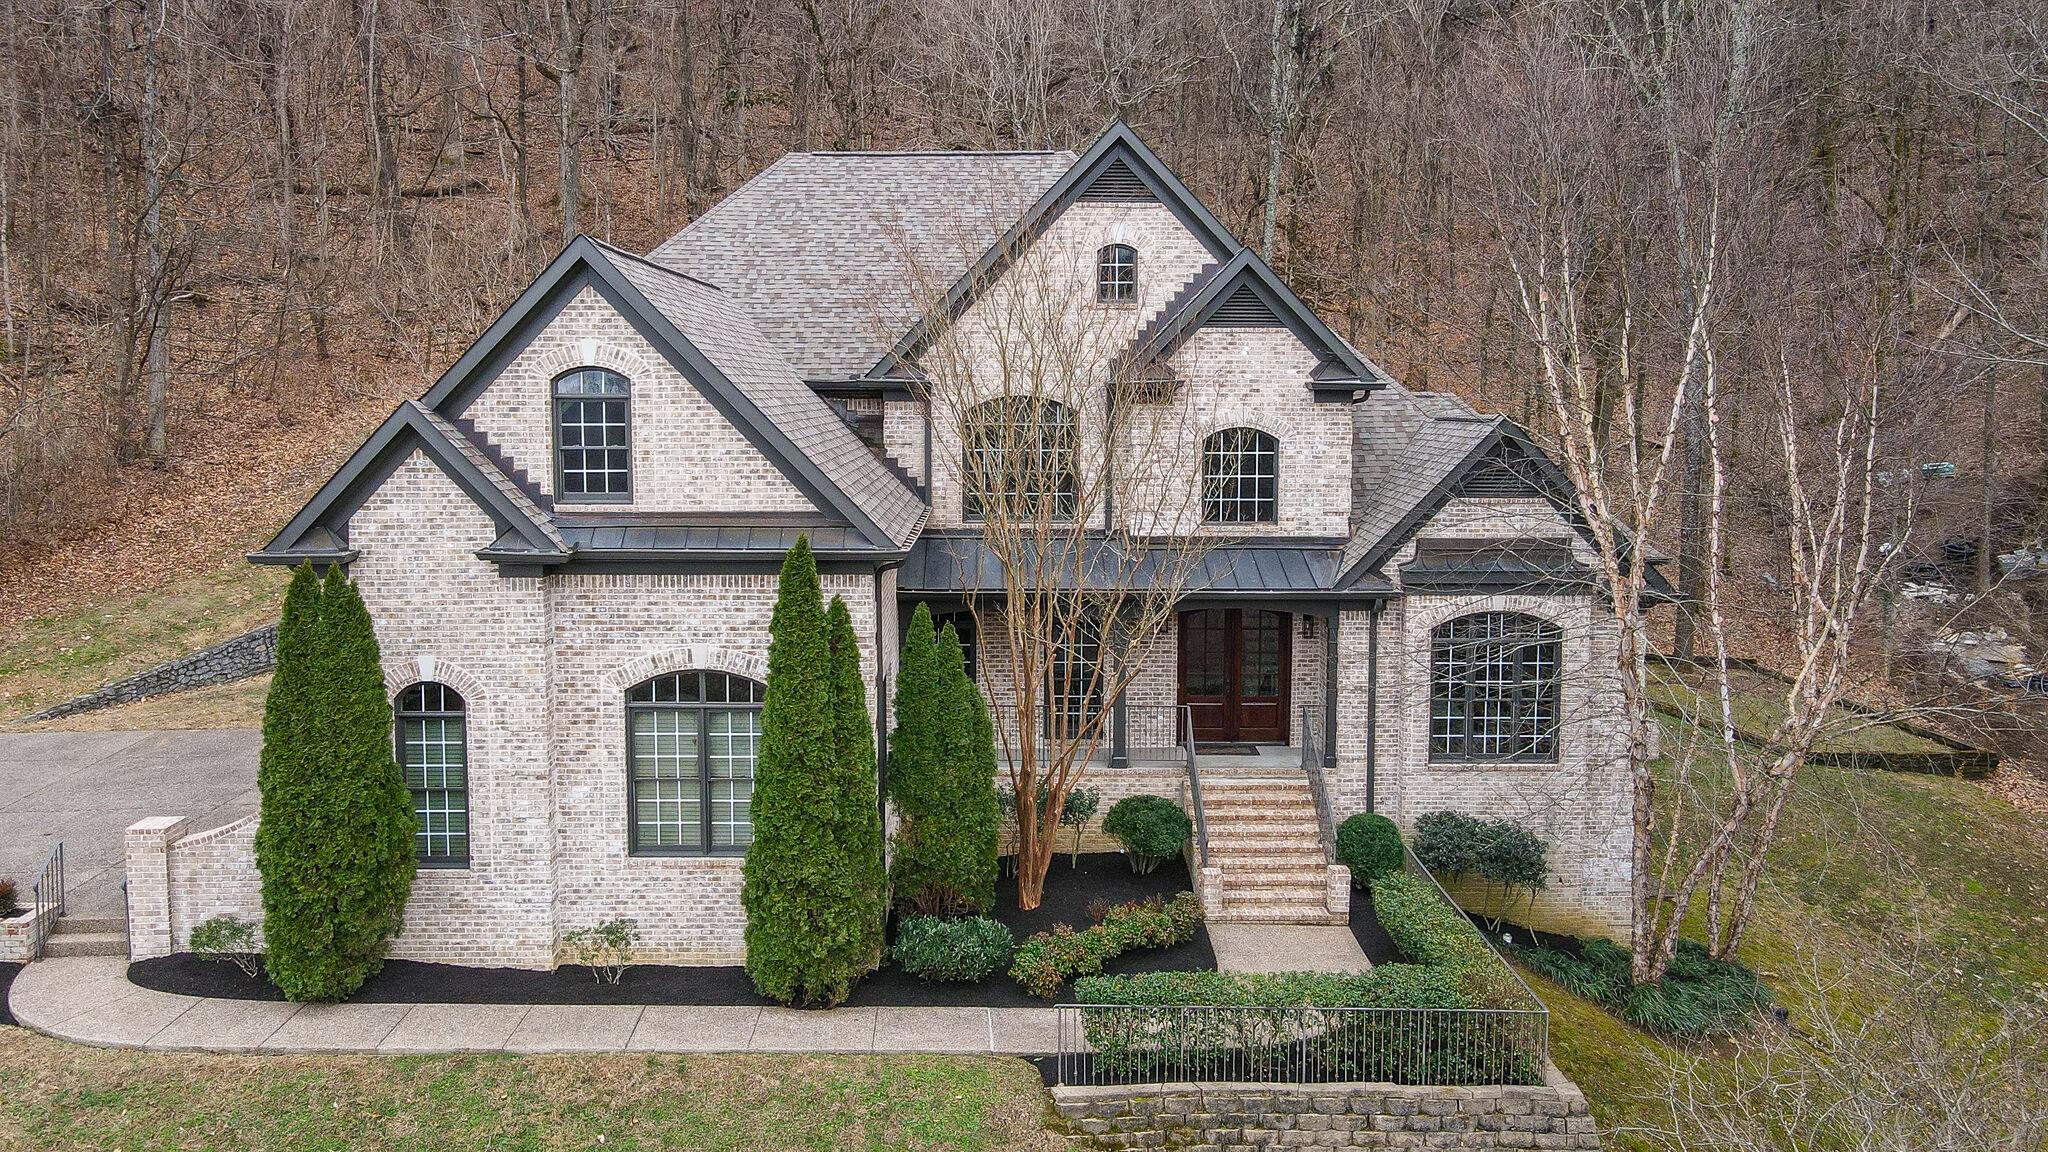 945 Travelers Ct Property Photo - Nashville, TN real estate listing